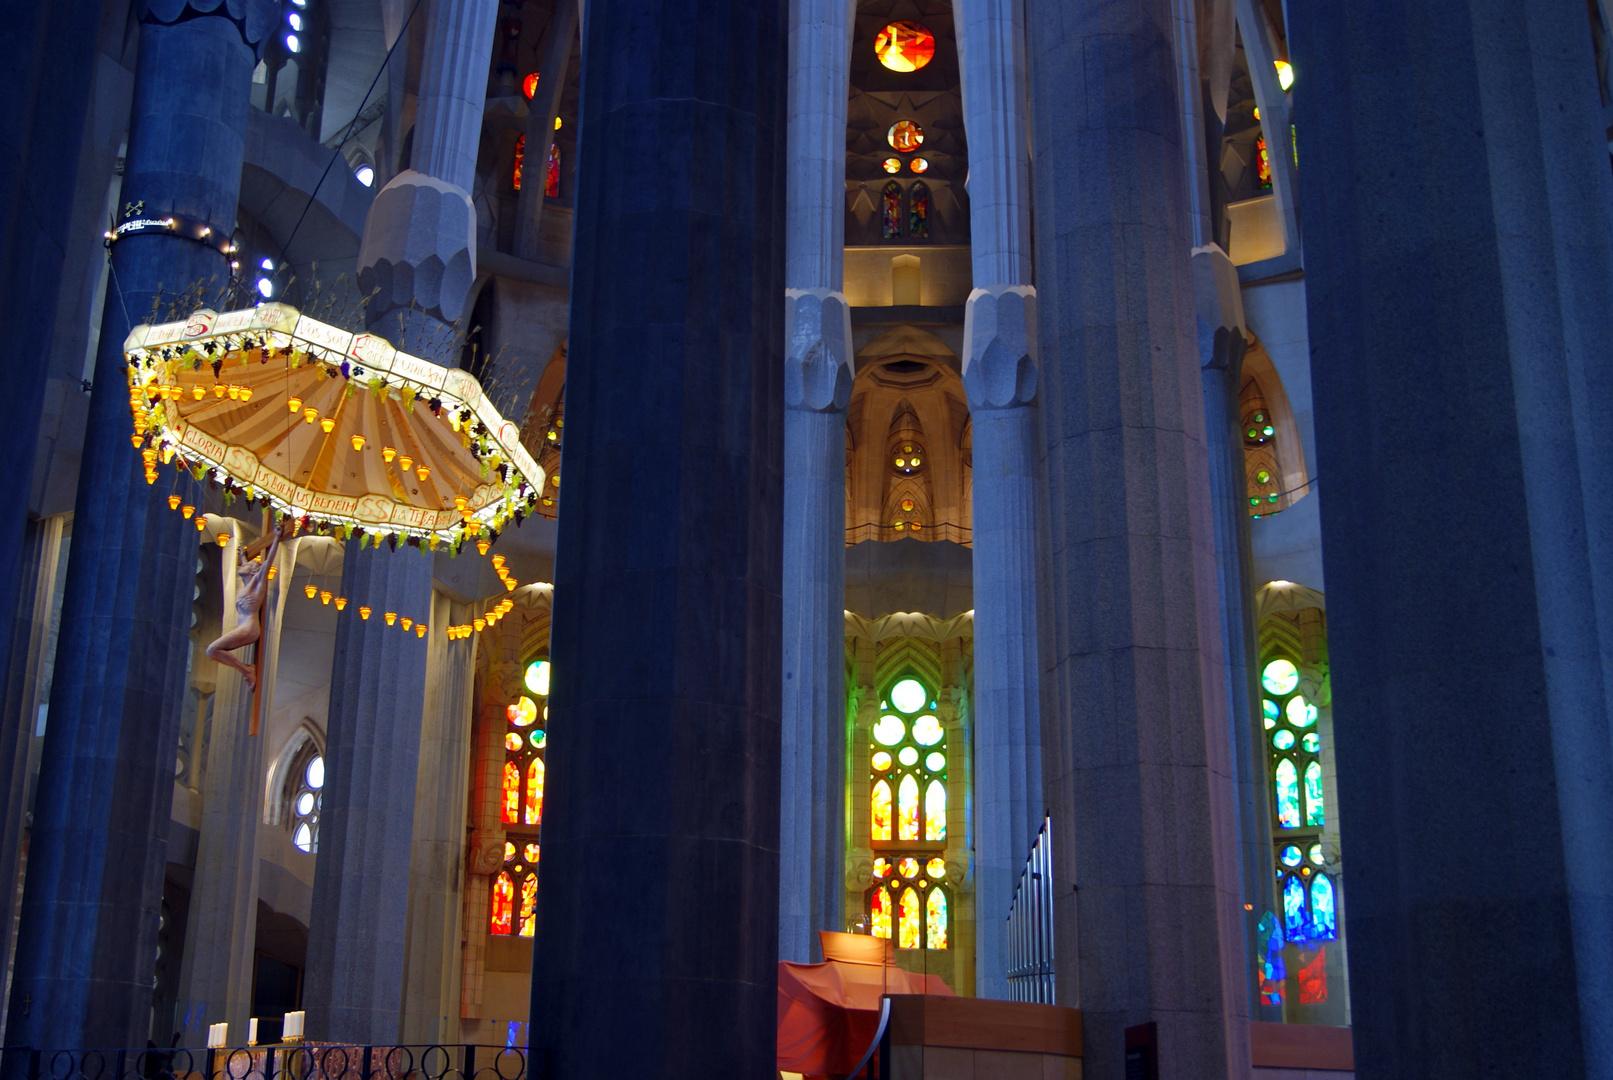 Altarraum der Sagrada Família, Barcelona